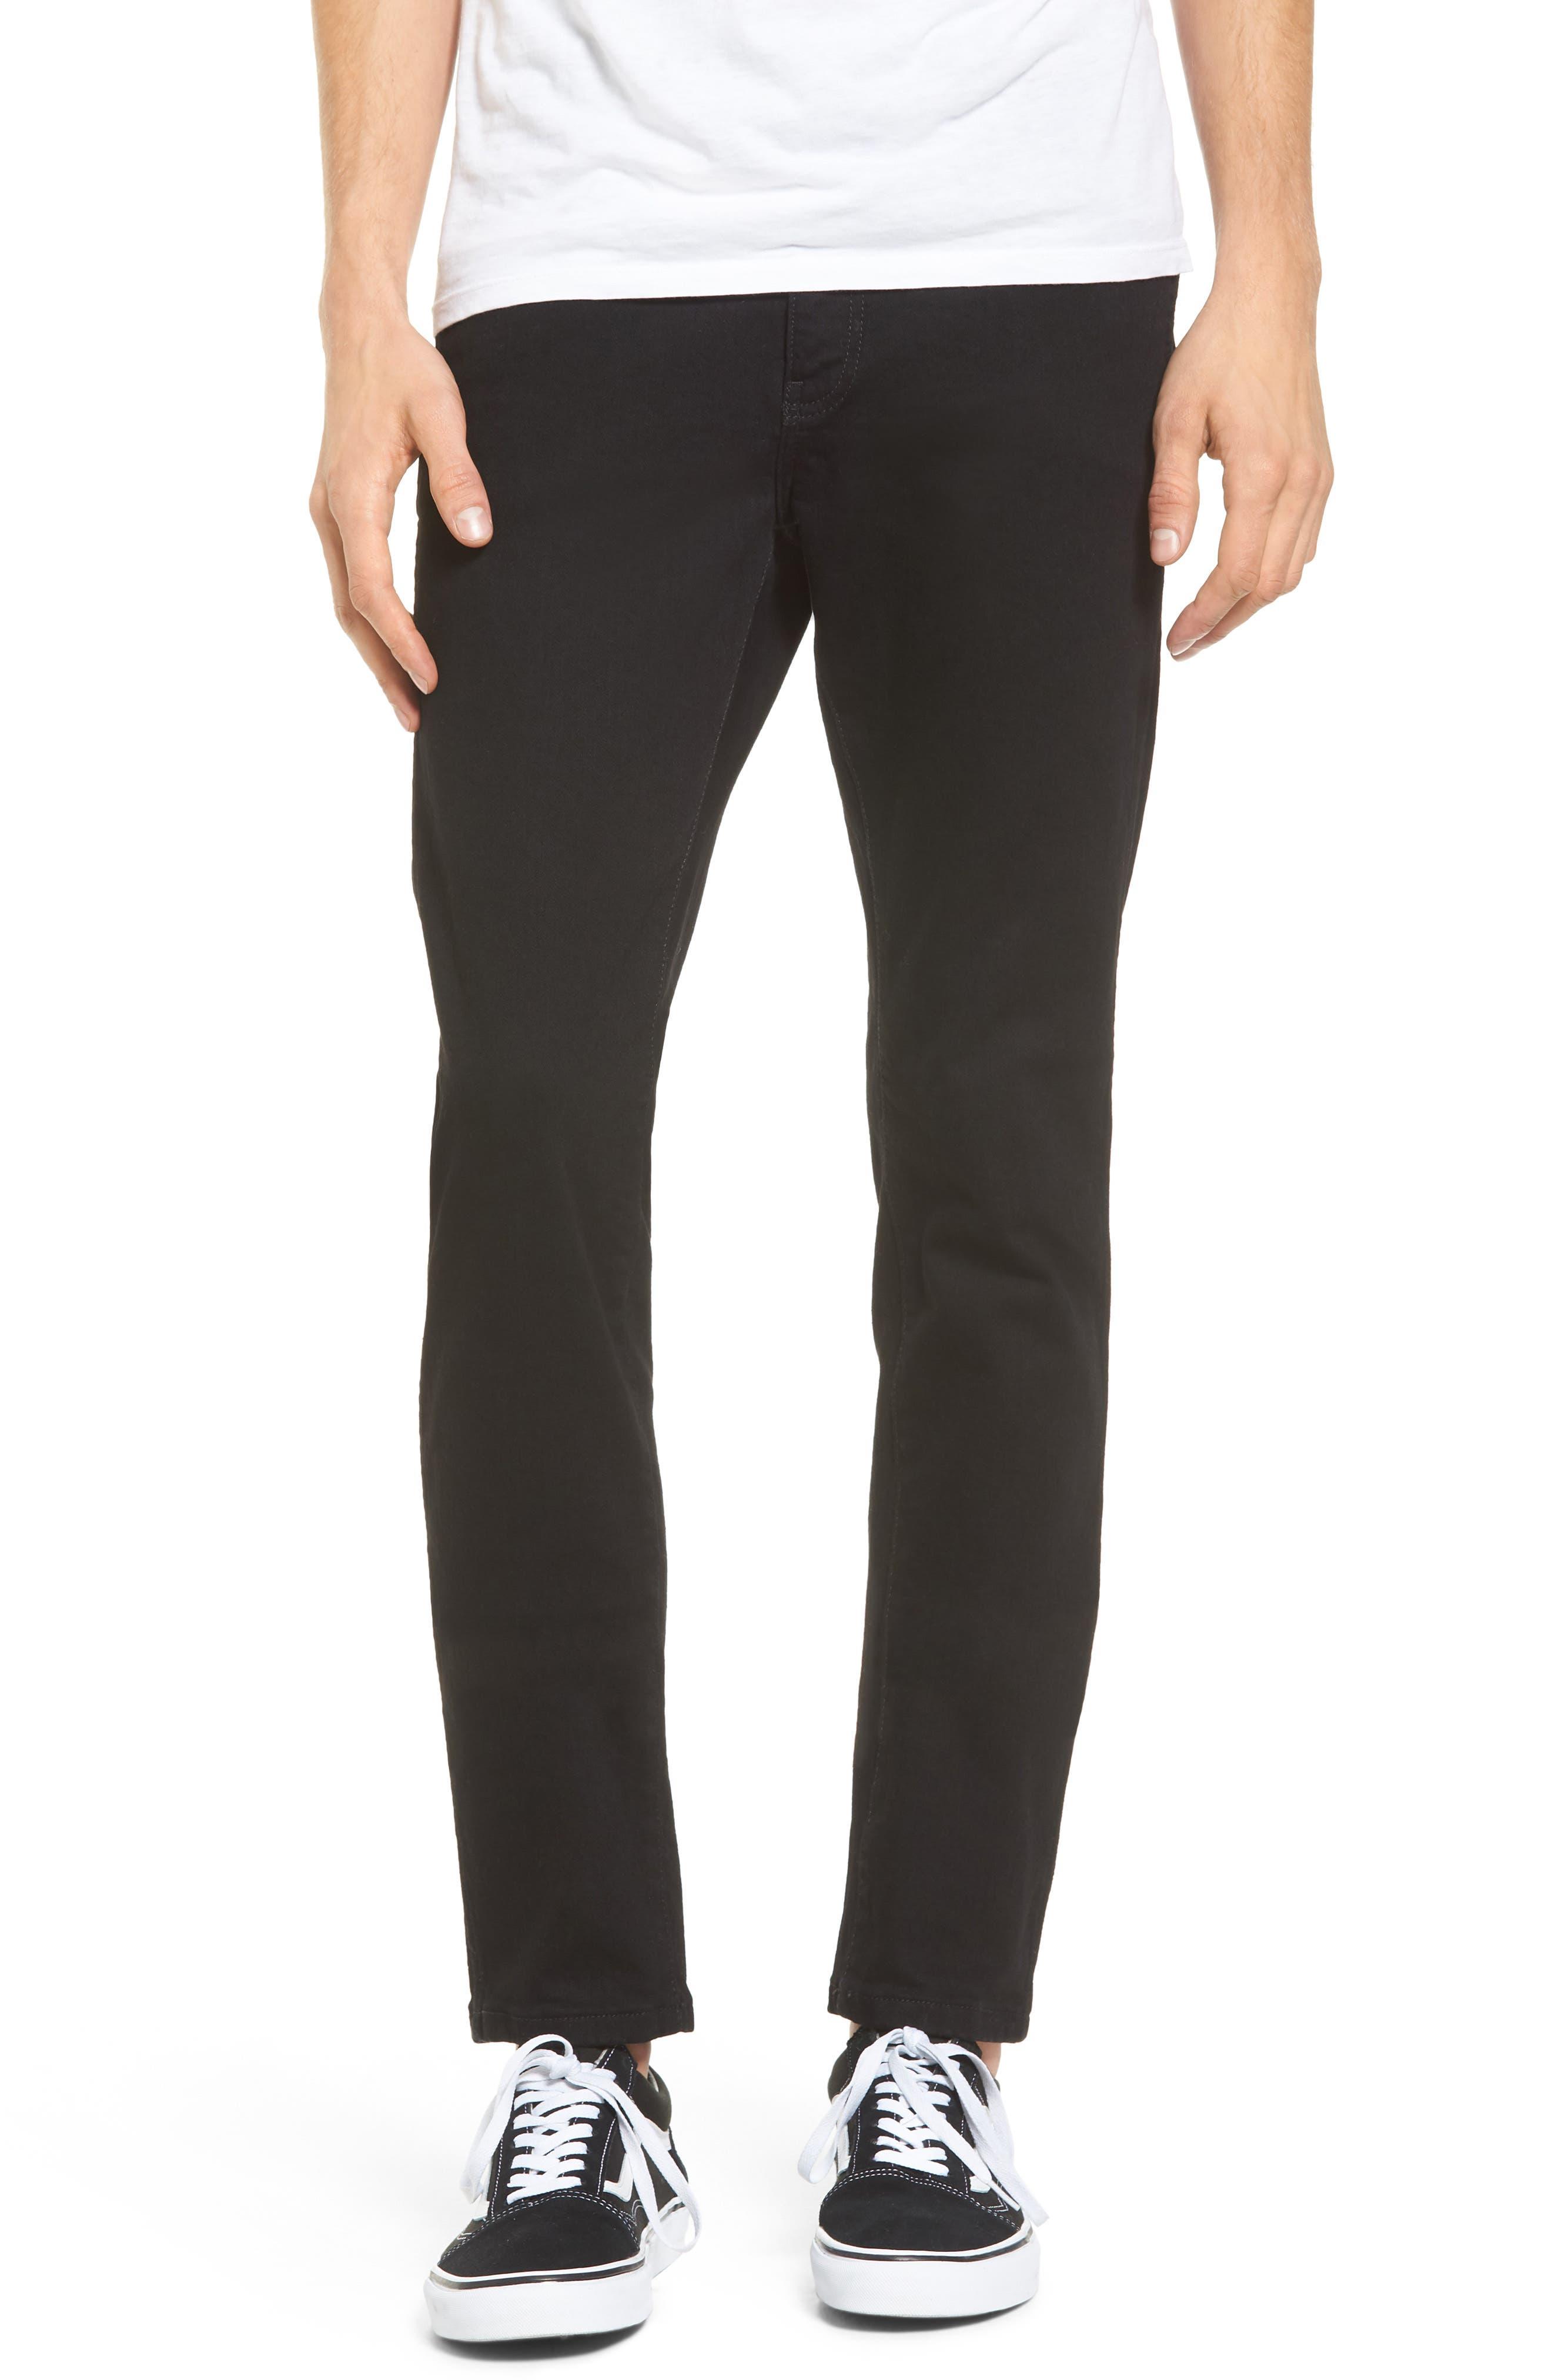 Snap Skinny Fit Jeans,                             Main thumbnail 1, color,                             Organic Black